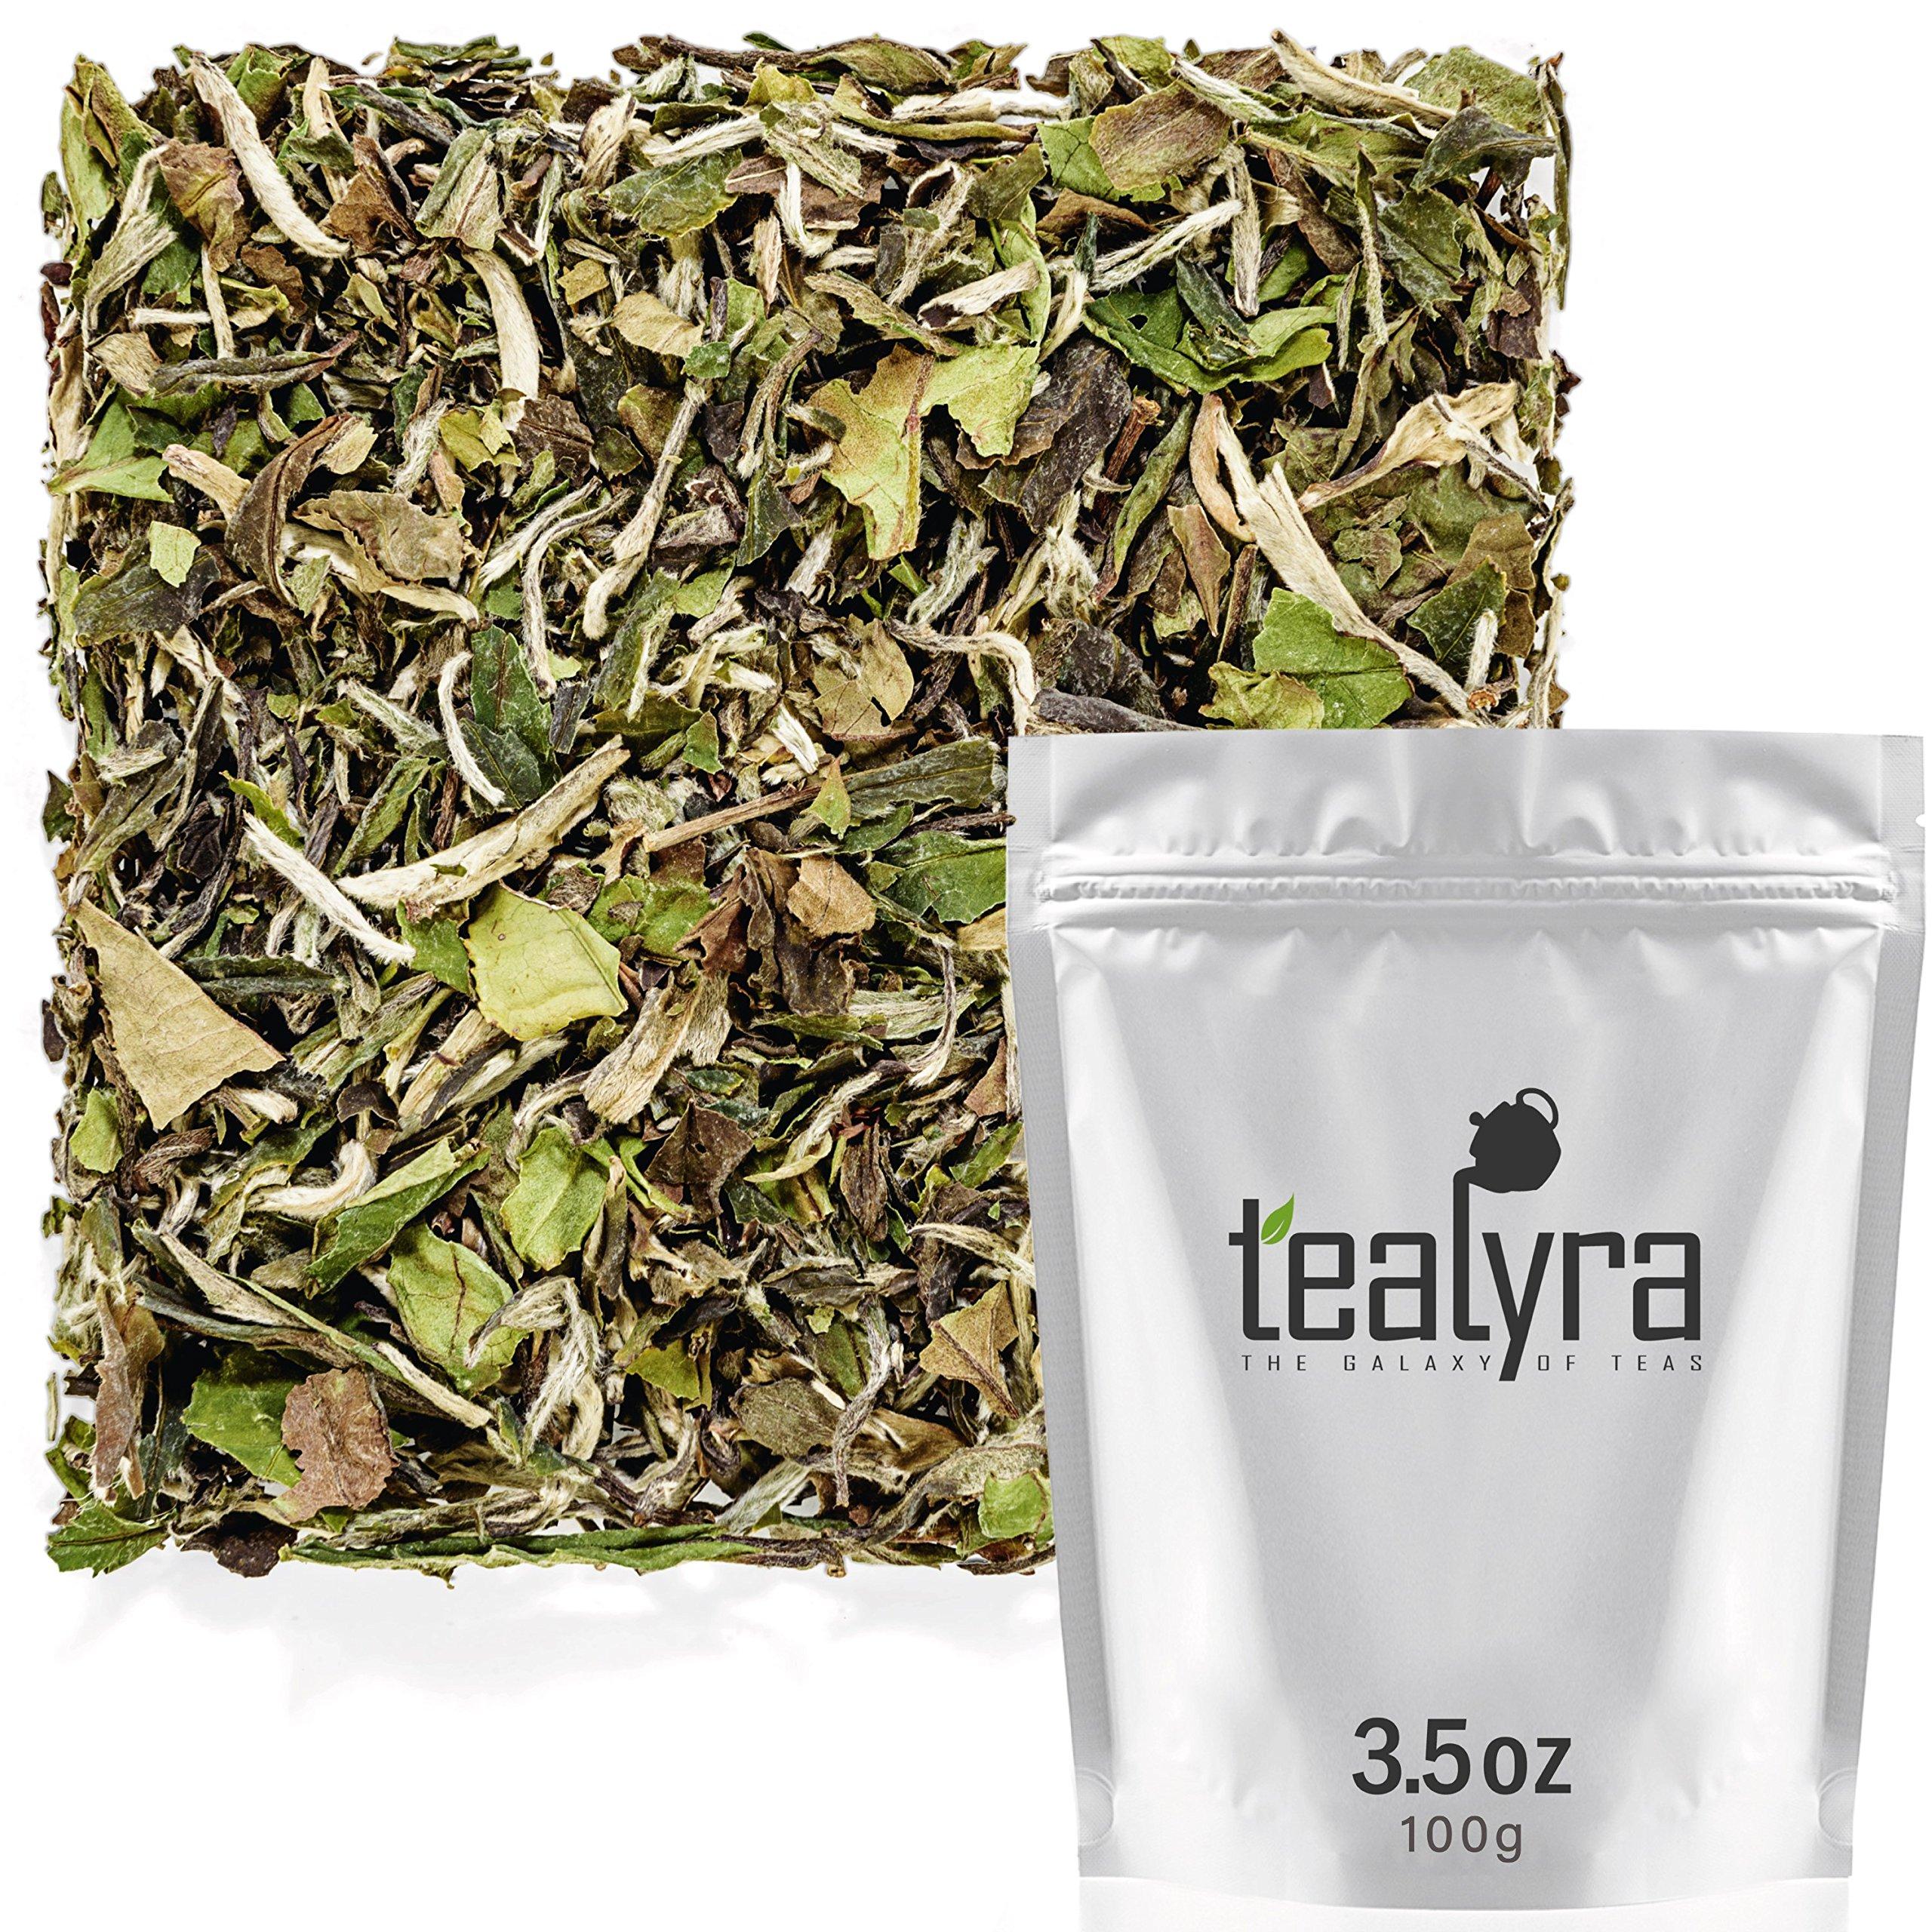 Tealyra - Imperial Grade White Peony - Bai Mu Tan - Fresh White Loose Leaf Tea - Organically Grown - Low Caffeine - High in Antioxidants - 100g (3.5-ounce) by Tealyra